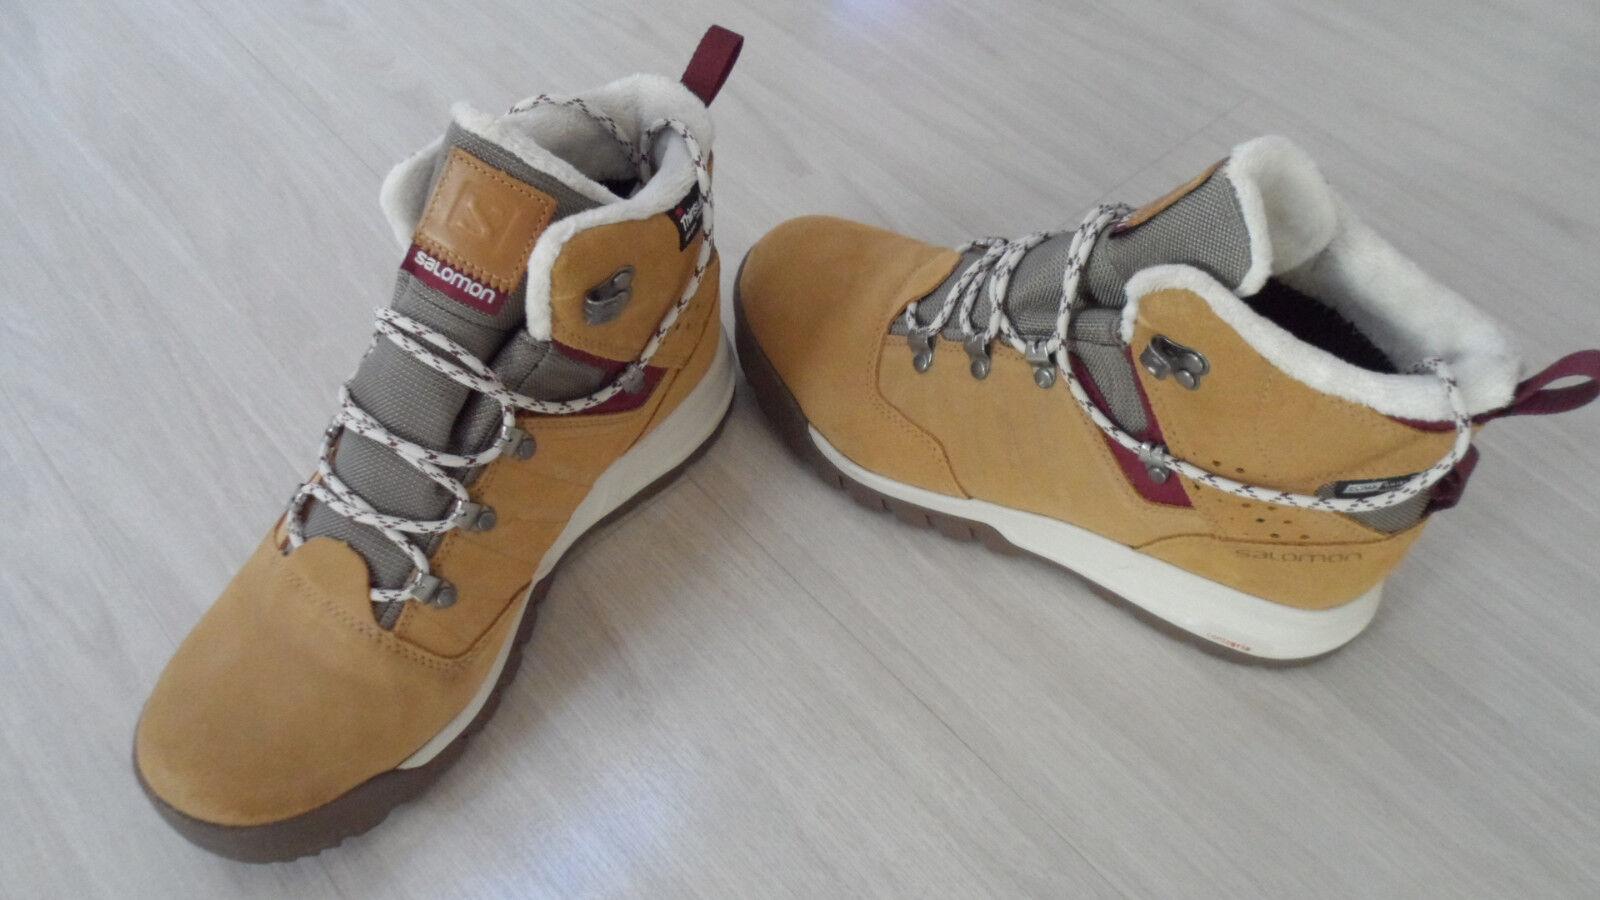 NEW  Salomon UTILITY TS CSWP Winter Hiking Stiefel. Stiefel. Stiefel. Waterproof. Sz 9 Retail  150 9bcaf2